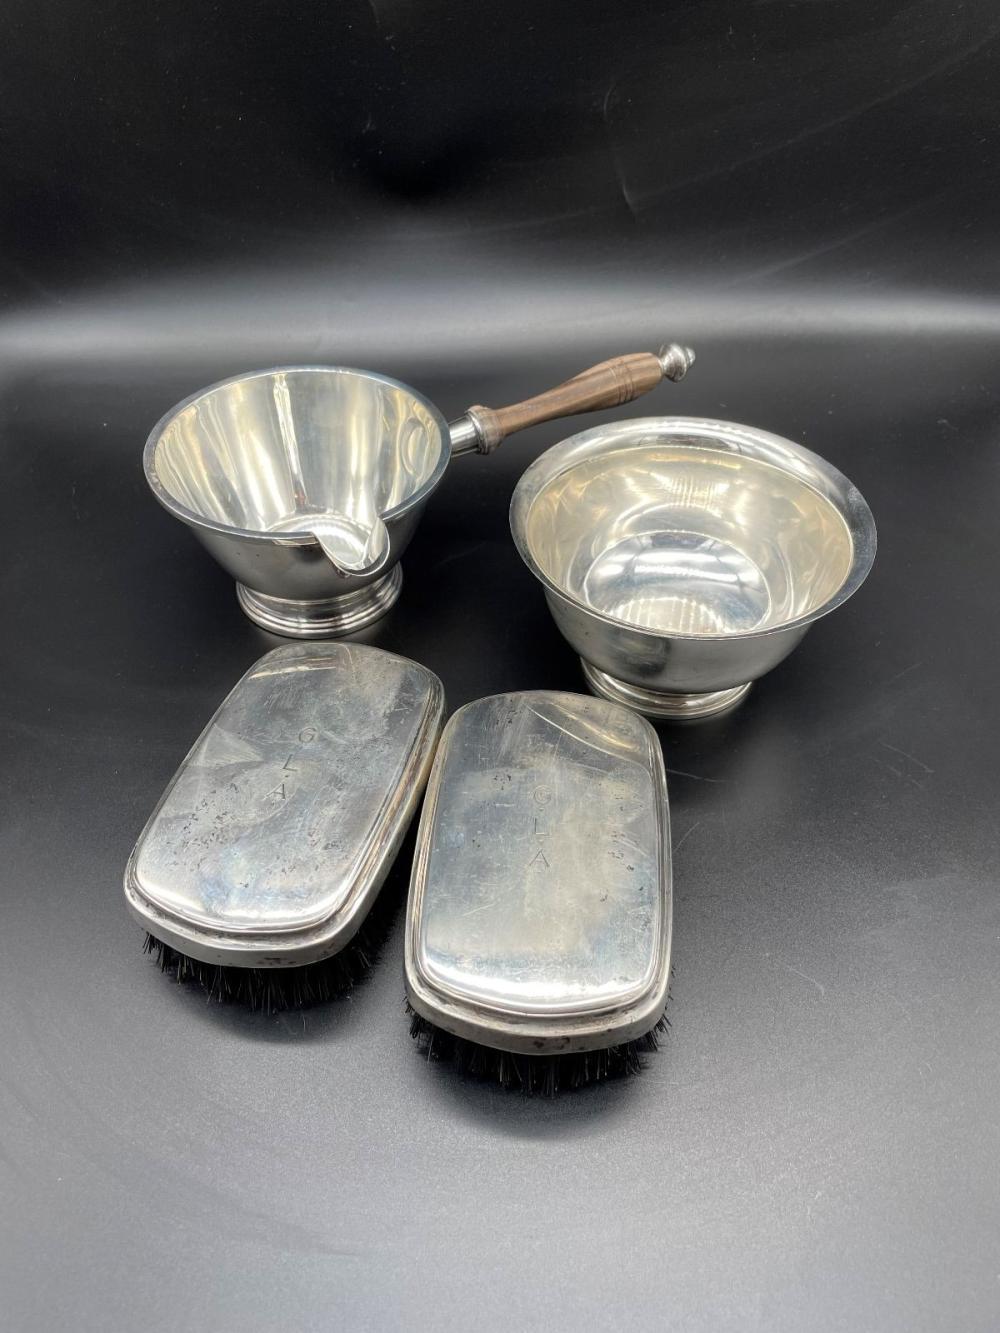 Sterling Silver Bowl, Handled Sauce, (2) Valet Brushes